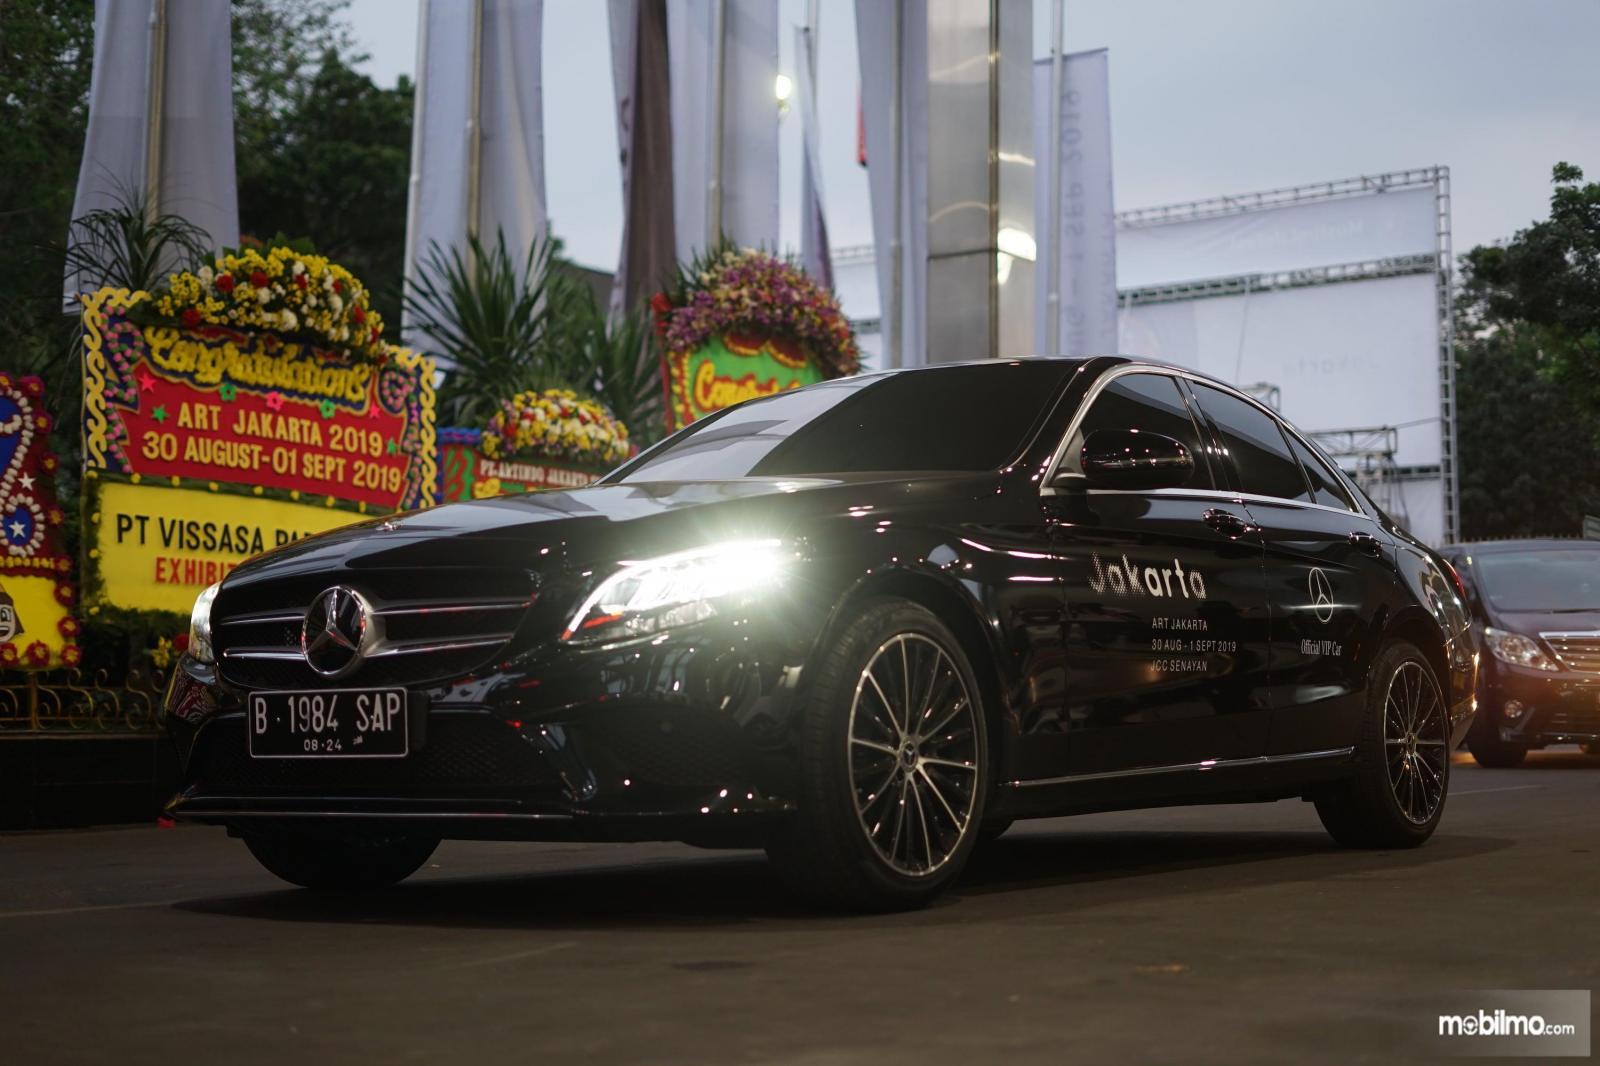 Foto mobil antar jemput Mercedes-Benz selama Art Jakarta 2019